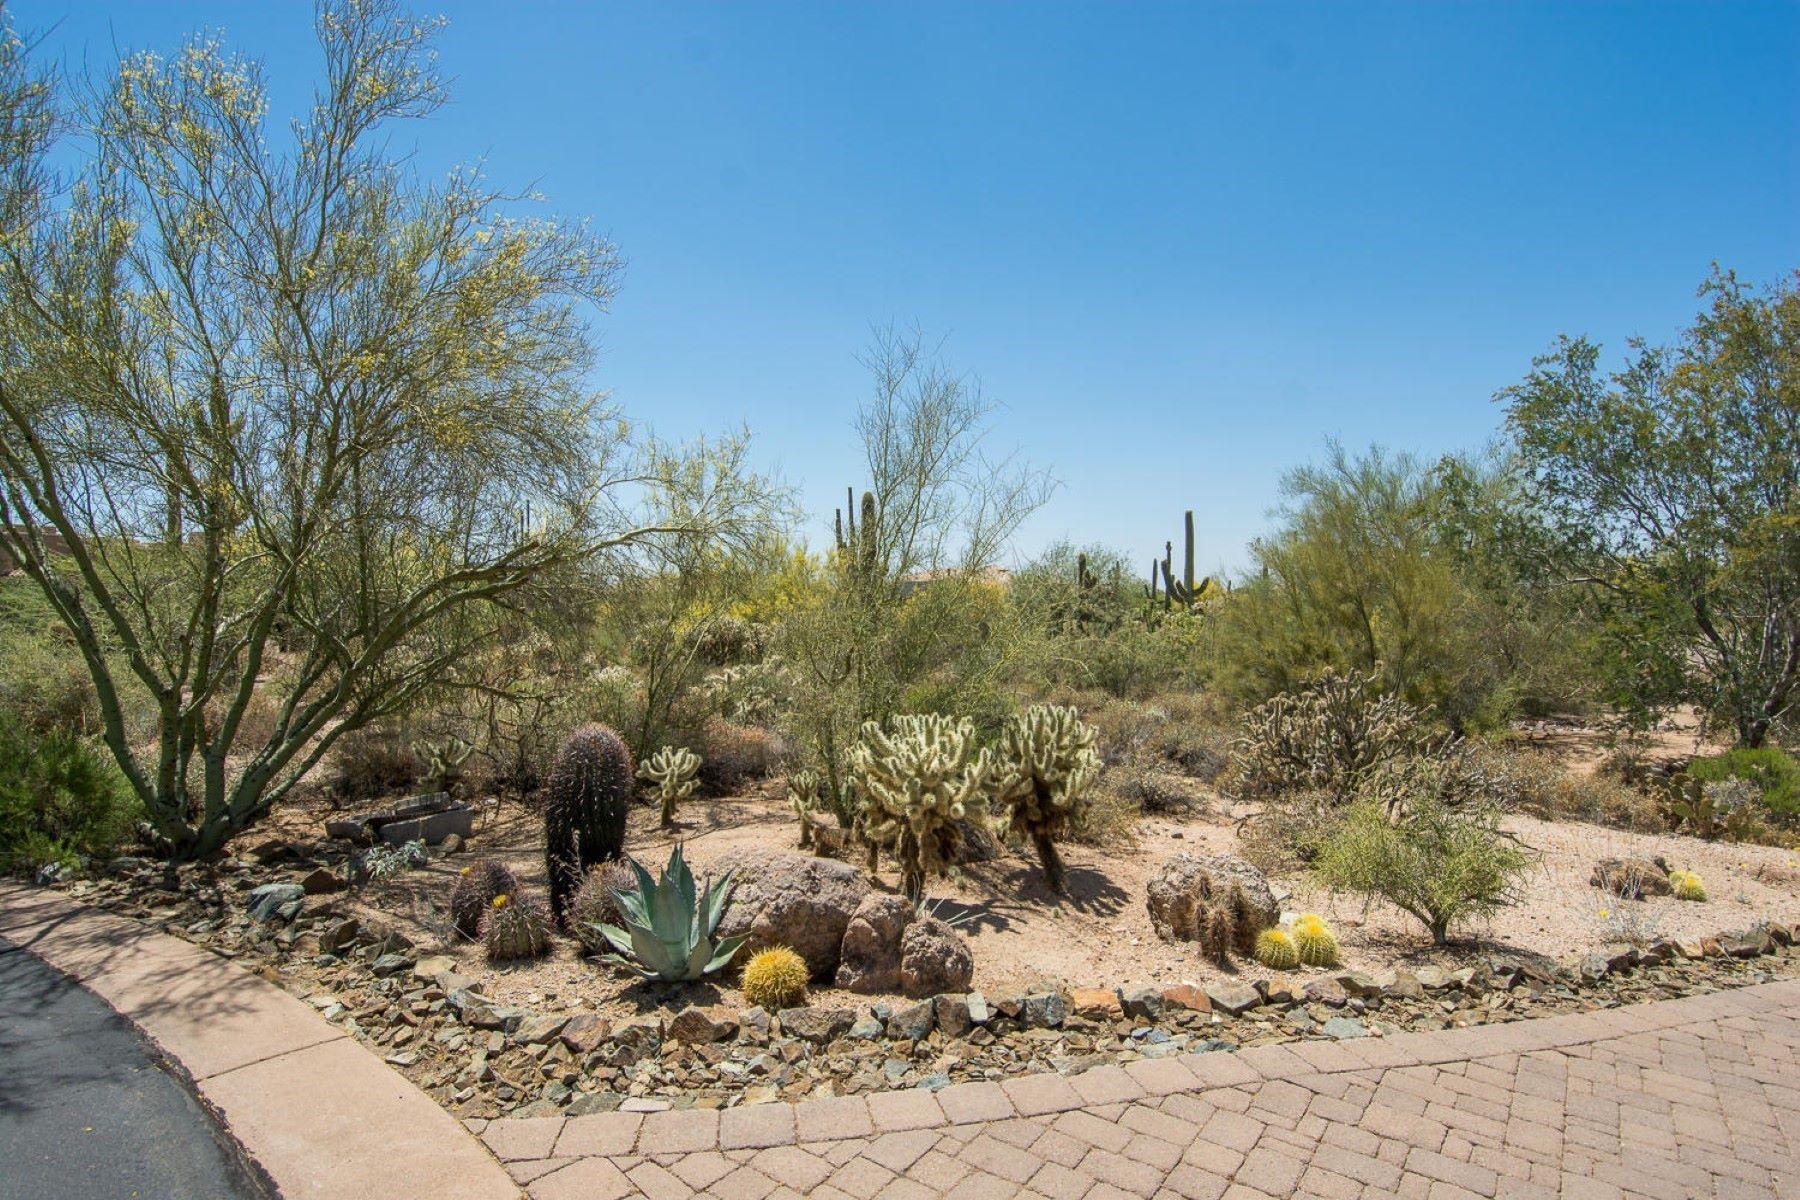 Terreno por un Venta en Desirable Sincuidados Guard Gated North Scottsdale Community 8300 E DIXILETA DR 279 Scottsdale, Arizona, 85266 Estados Unidos